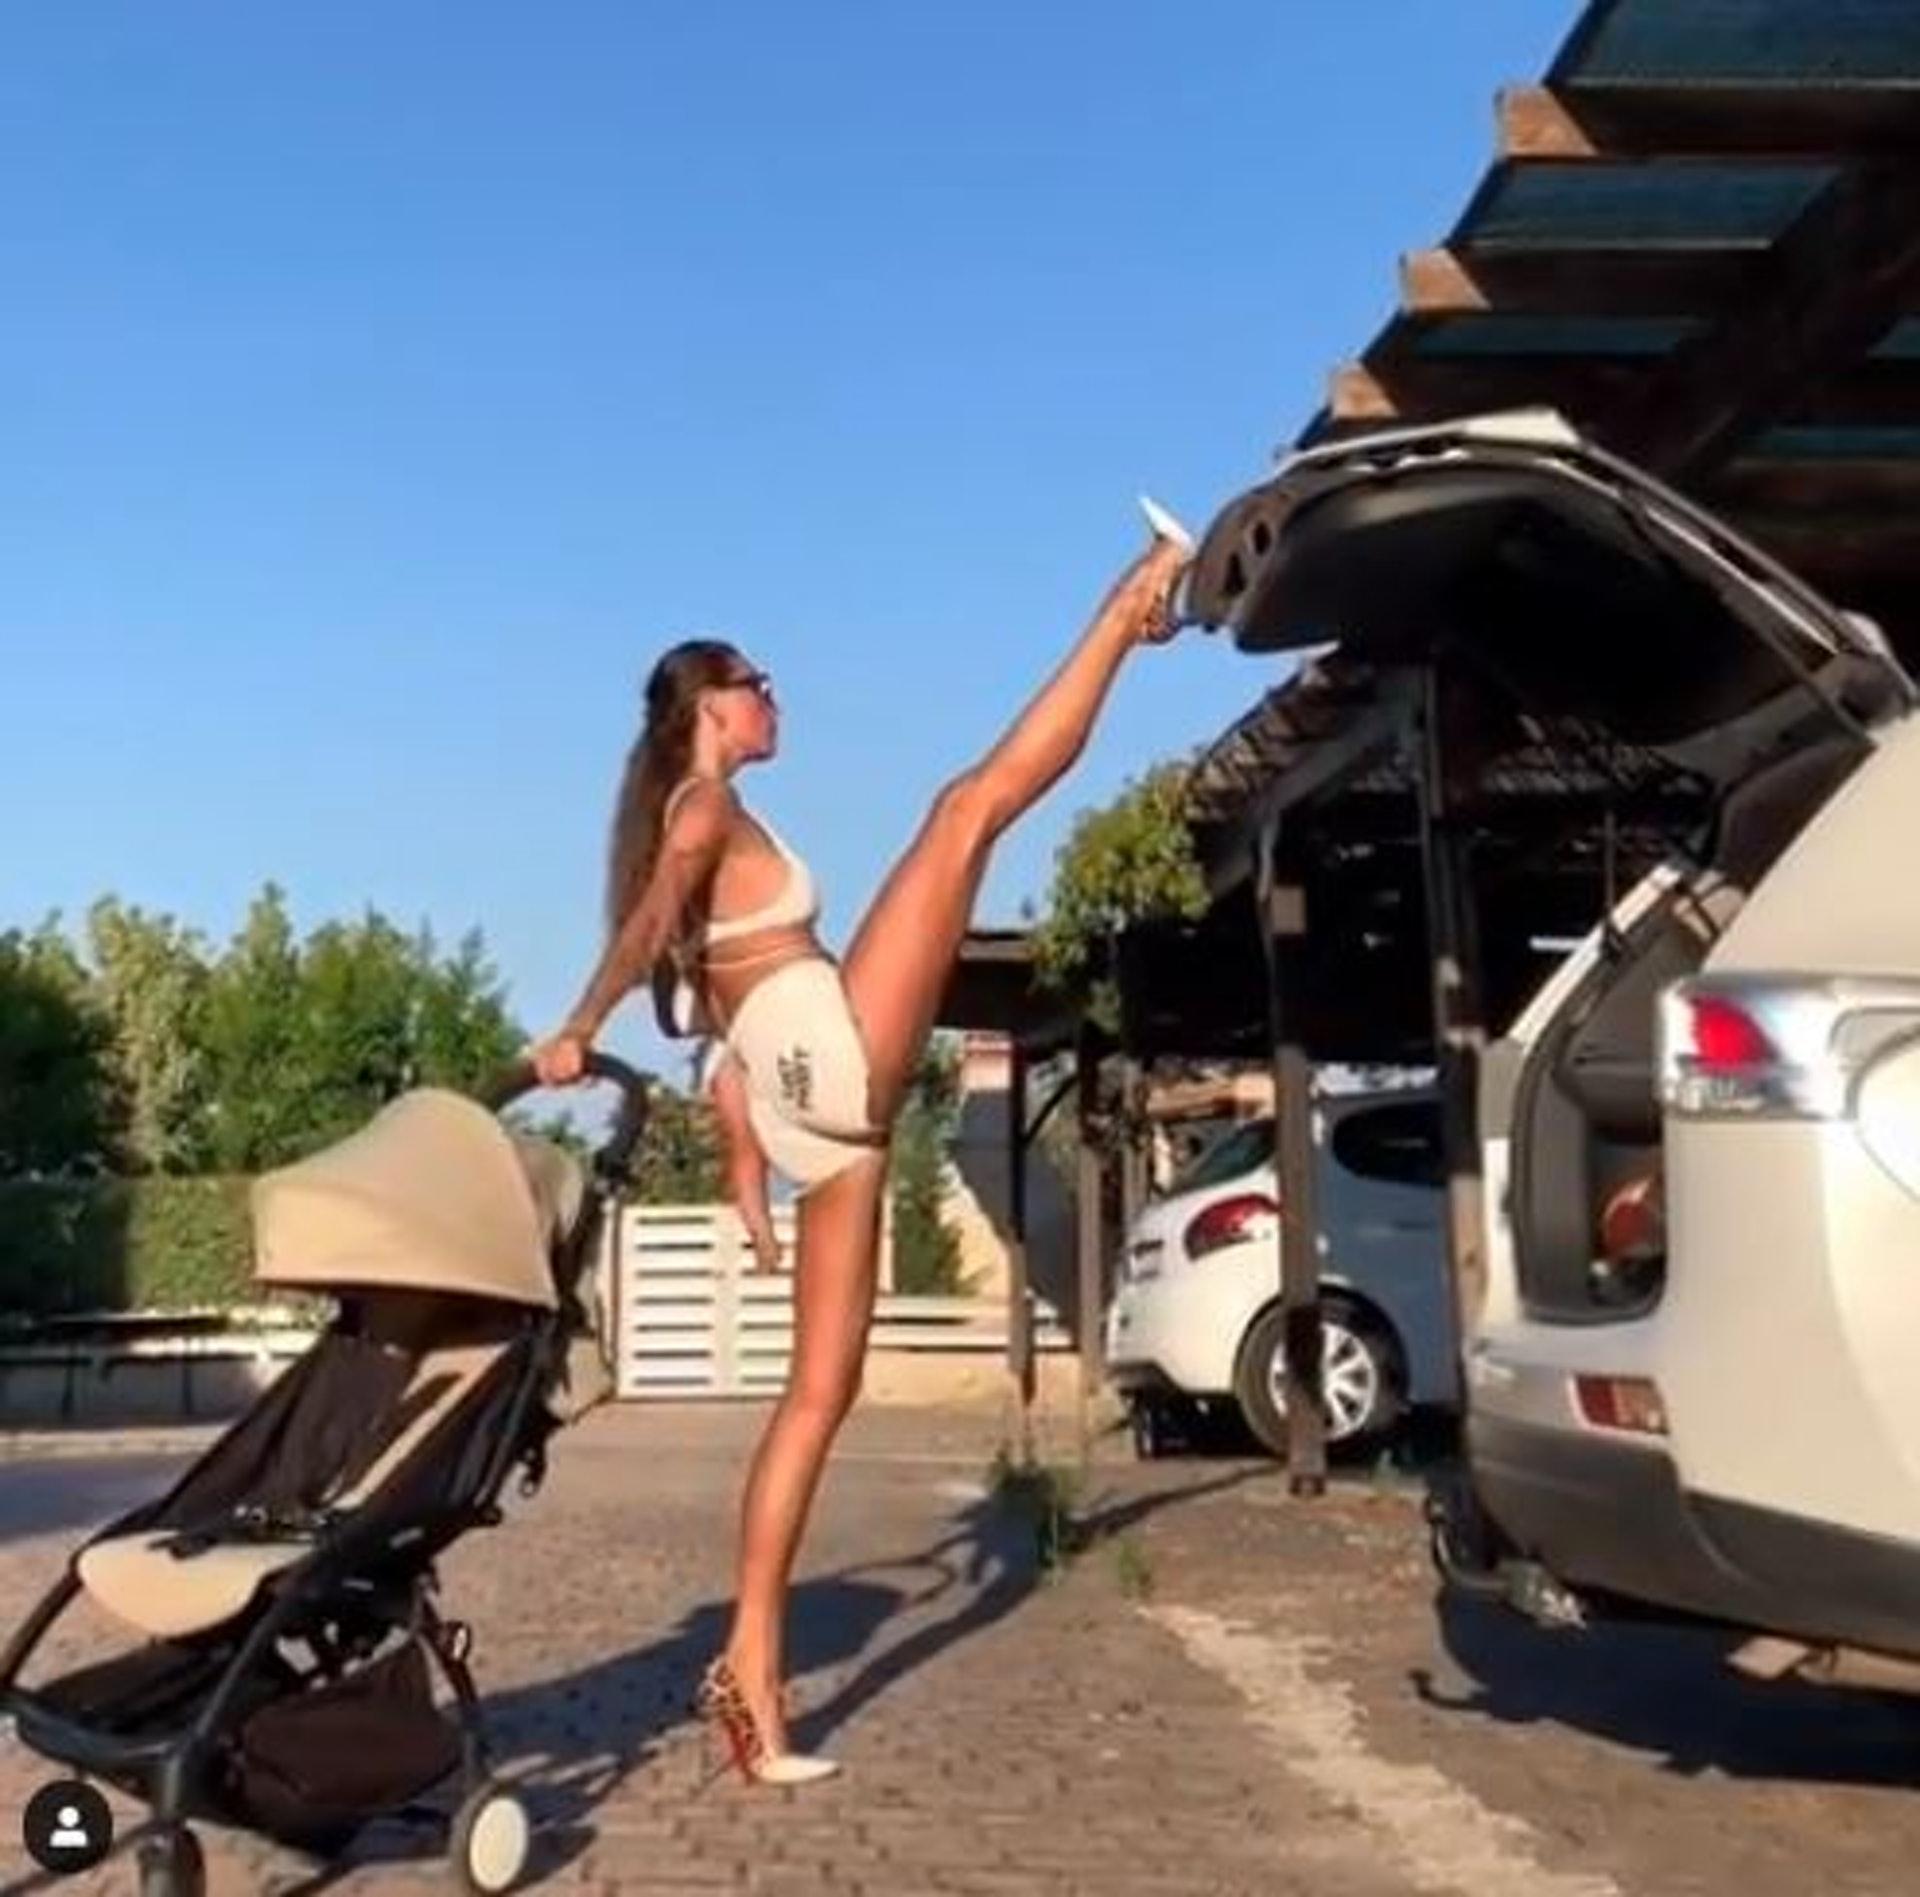 Anna Kanyuk 這招抬腿關車尾範引起一陣熱潮。(IG影片截圖/anna_kanyuk)